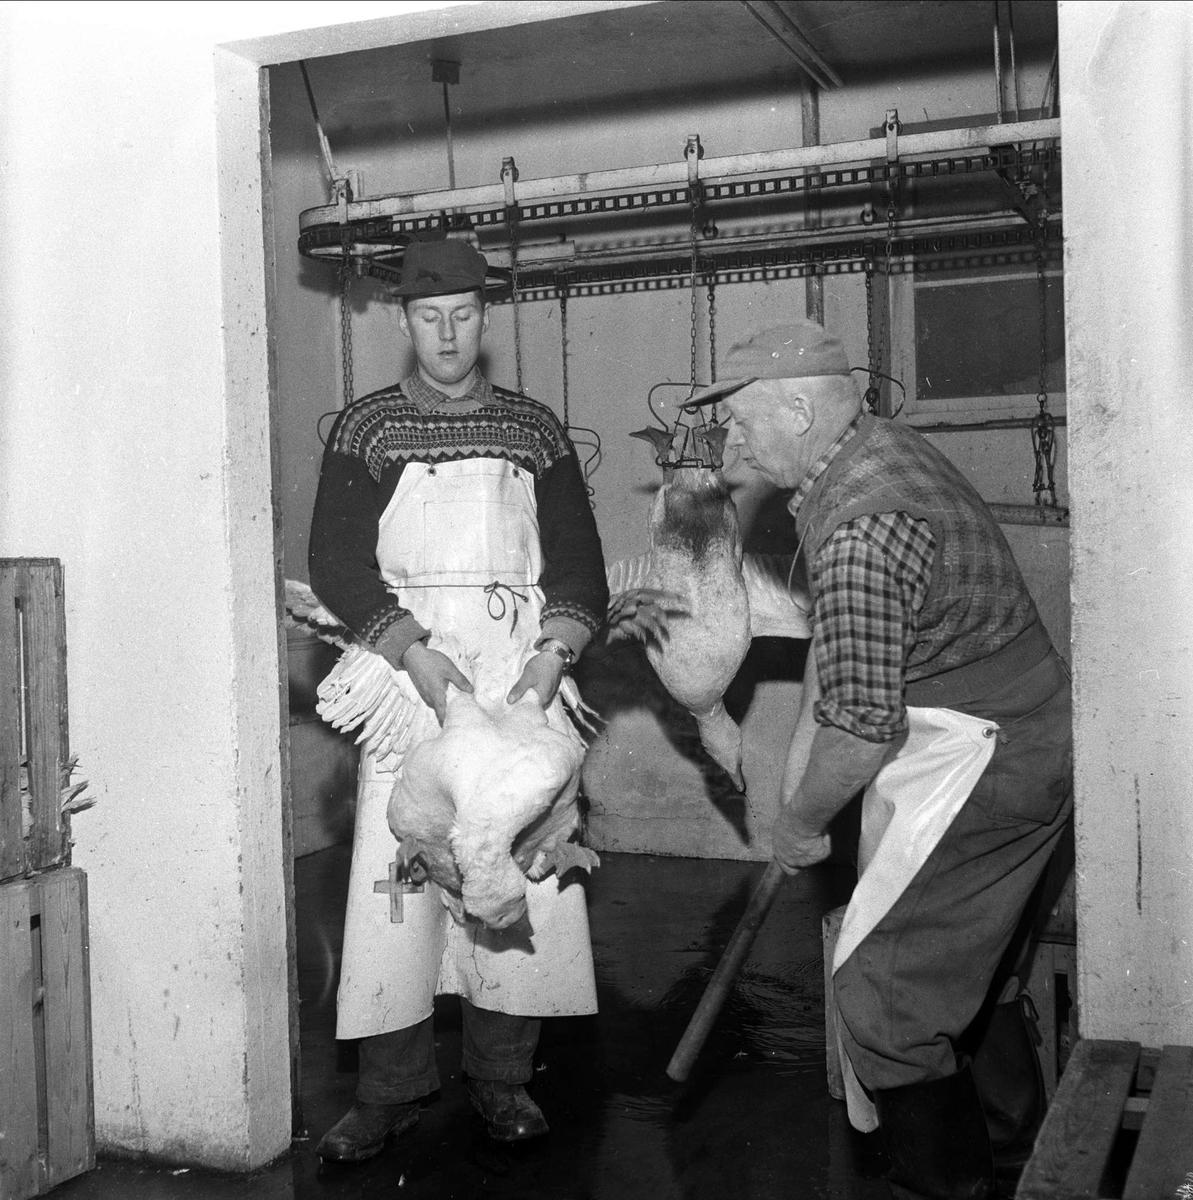 Mortensgås i Rakkestad, klubbing av gjess, Rakkestad, 10.11.1958